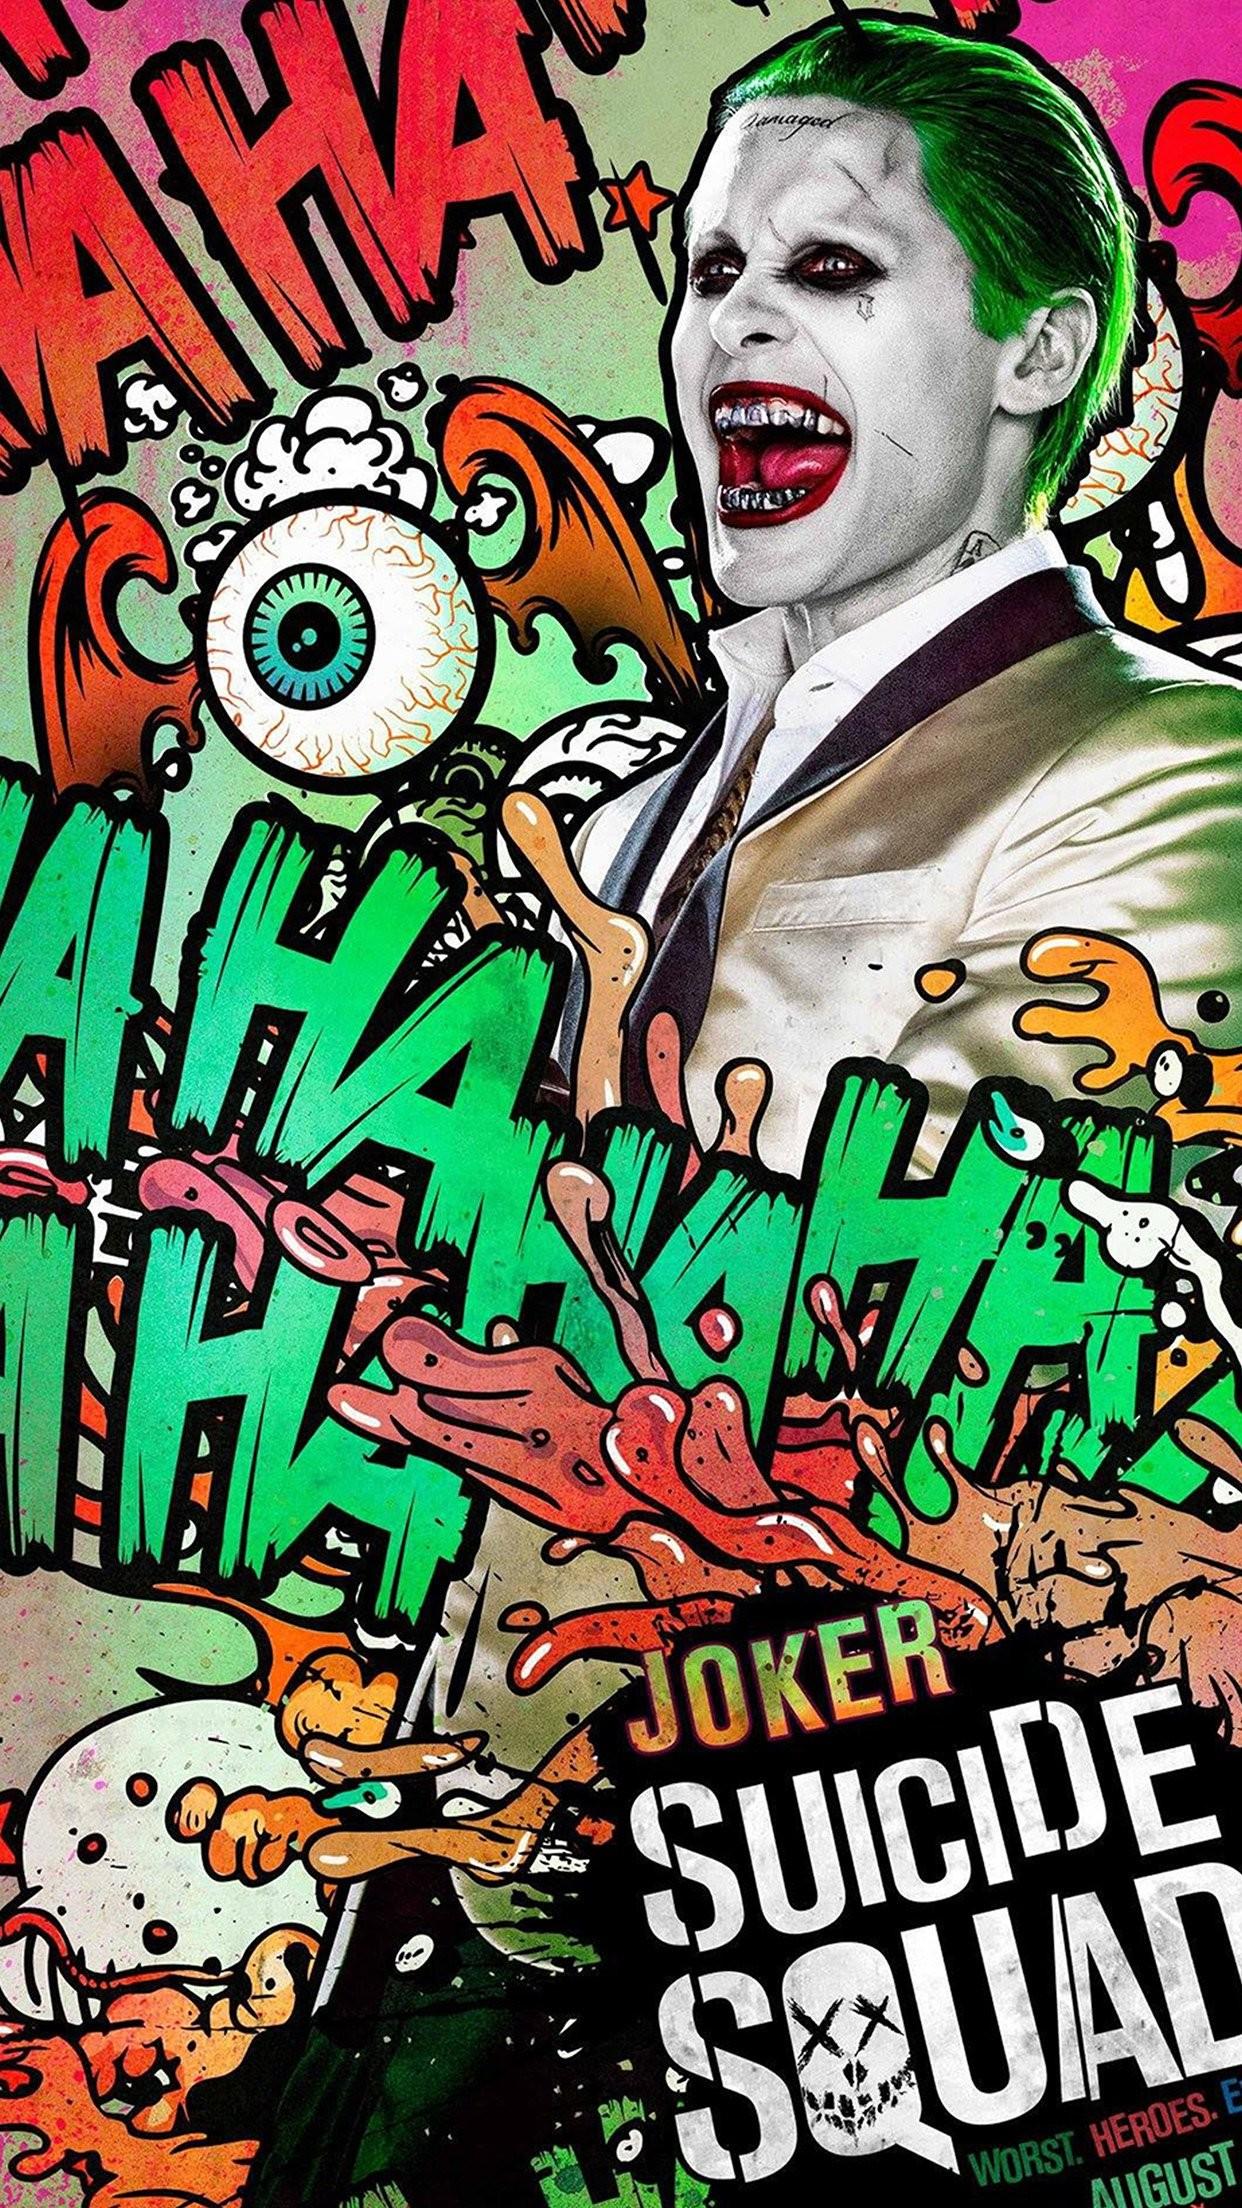 cool suicide-squad-film-poster-art-illustration-joker-iphone6